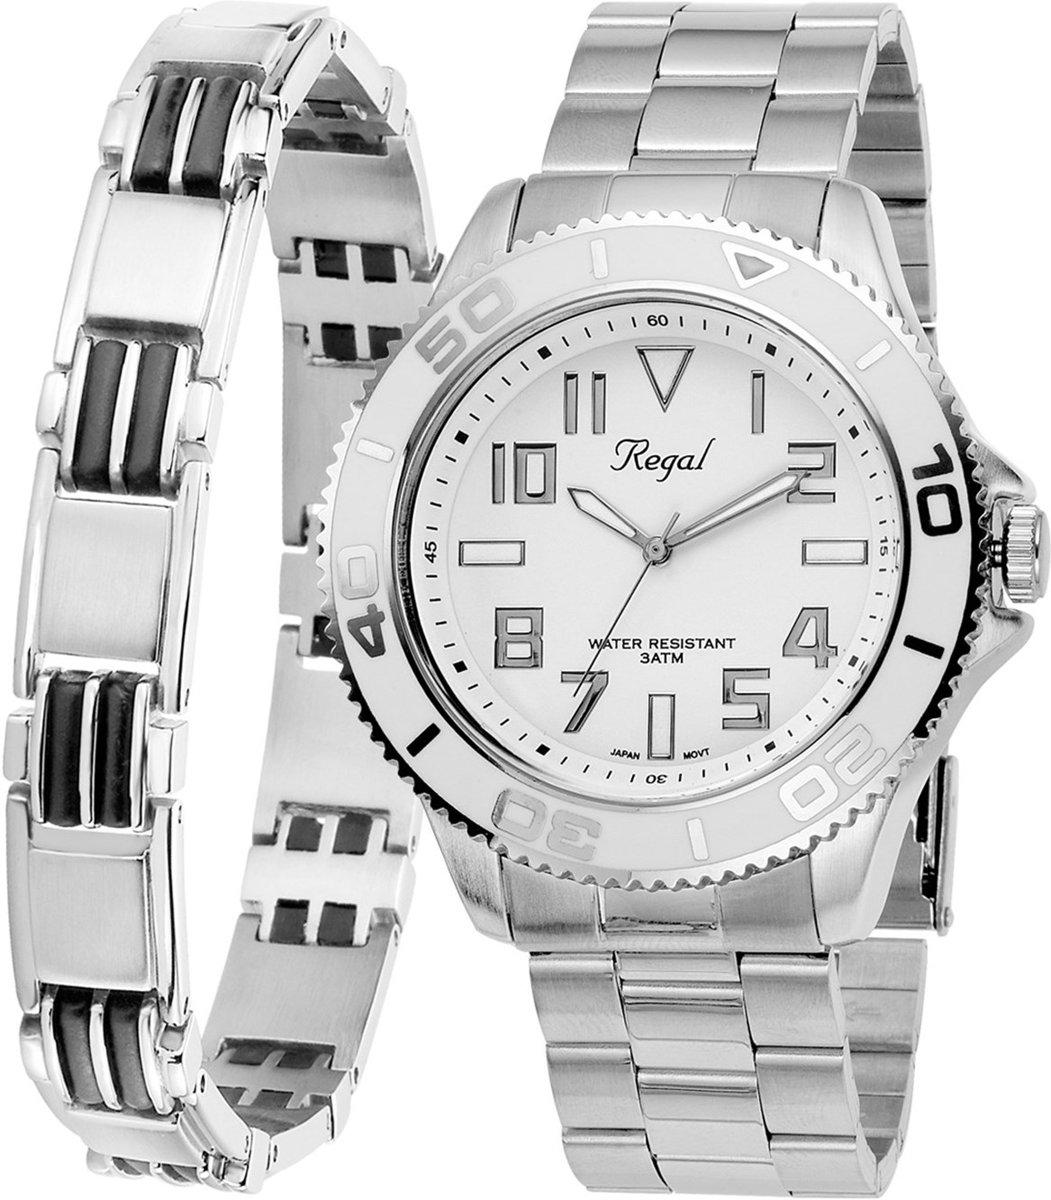 Lucardi - Stalen set armband & Regal horloge R14793-112 - maat 21 kopen